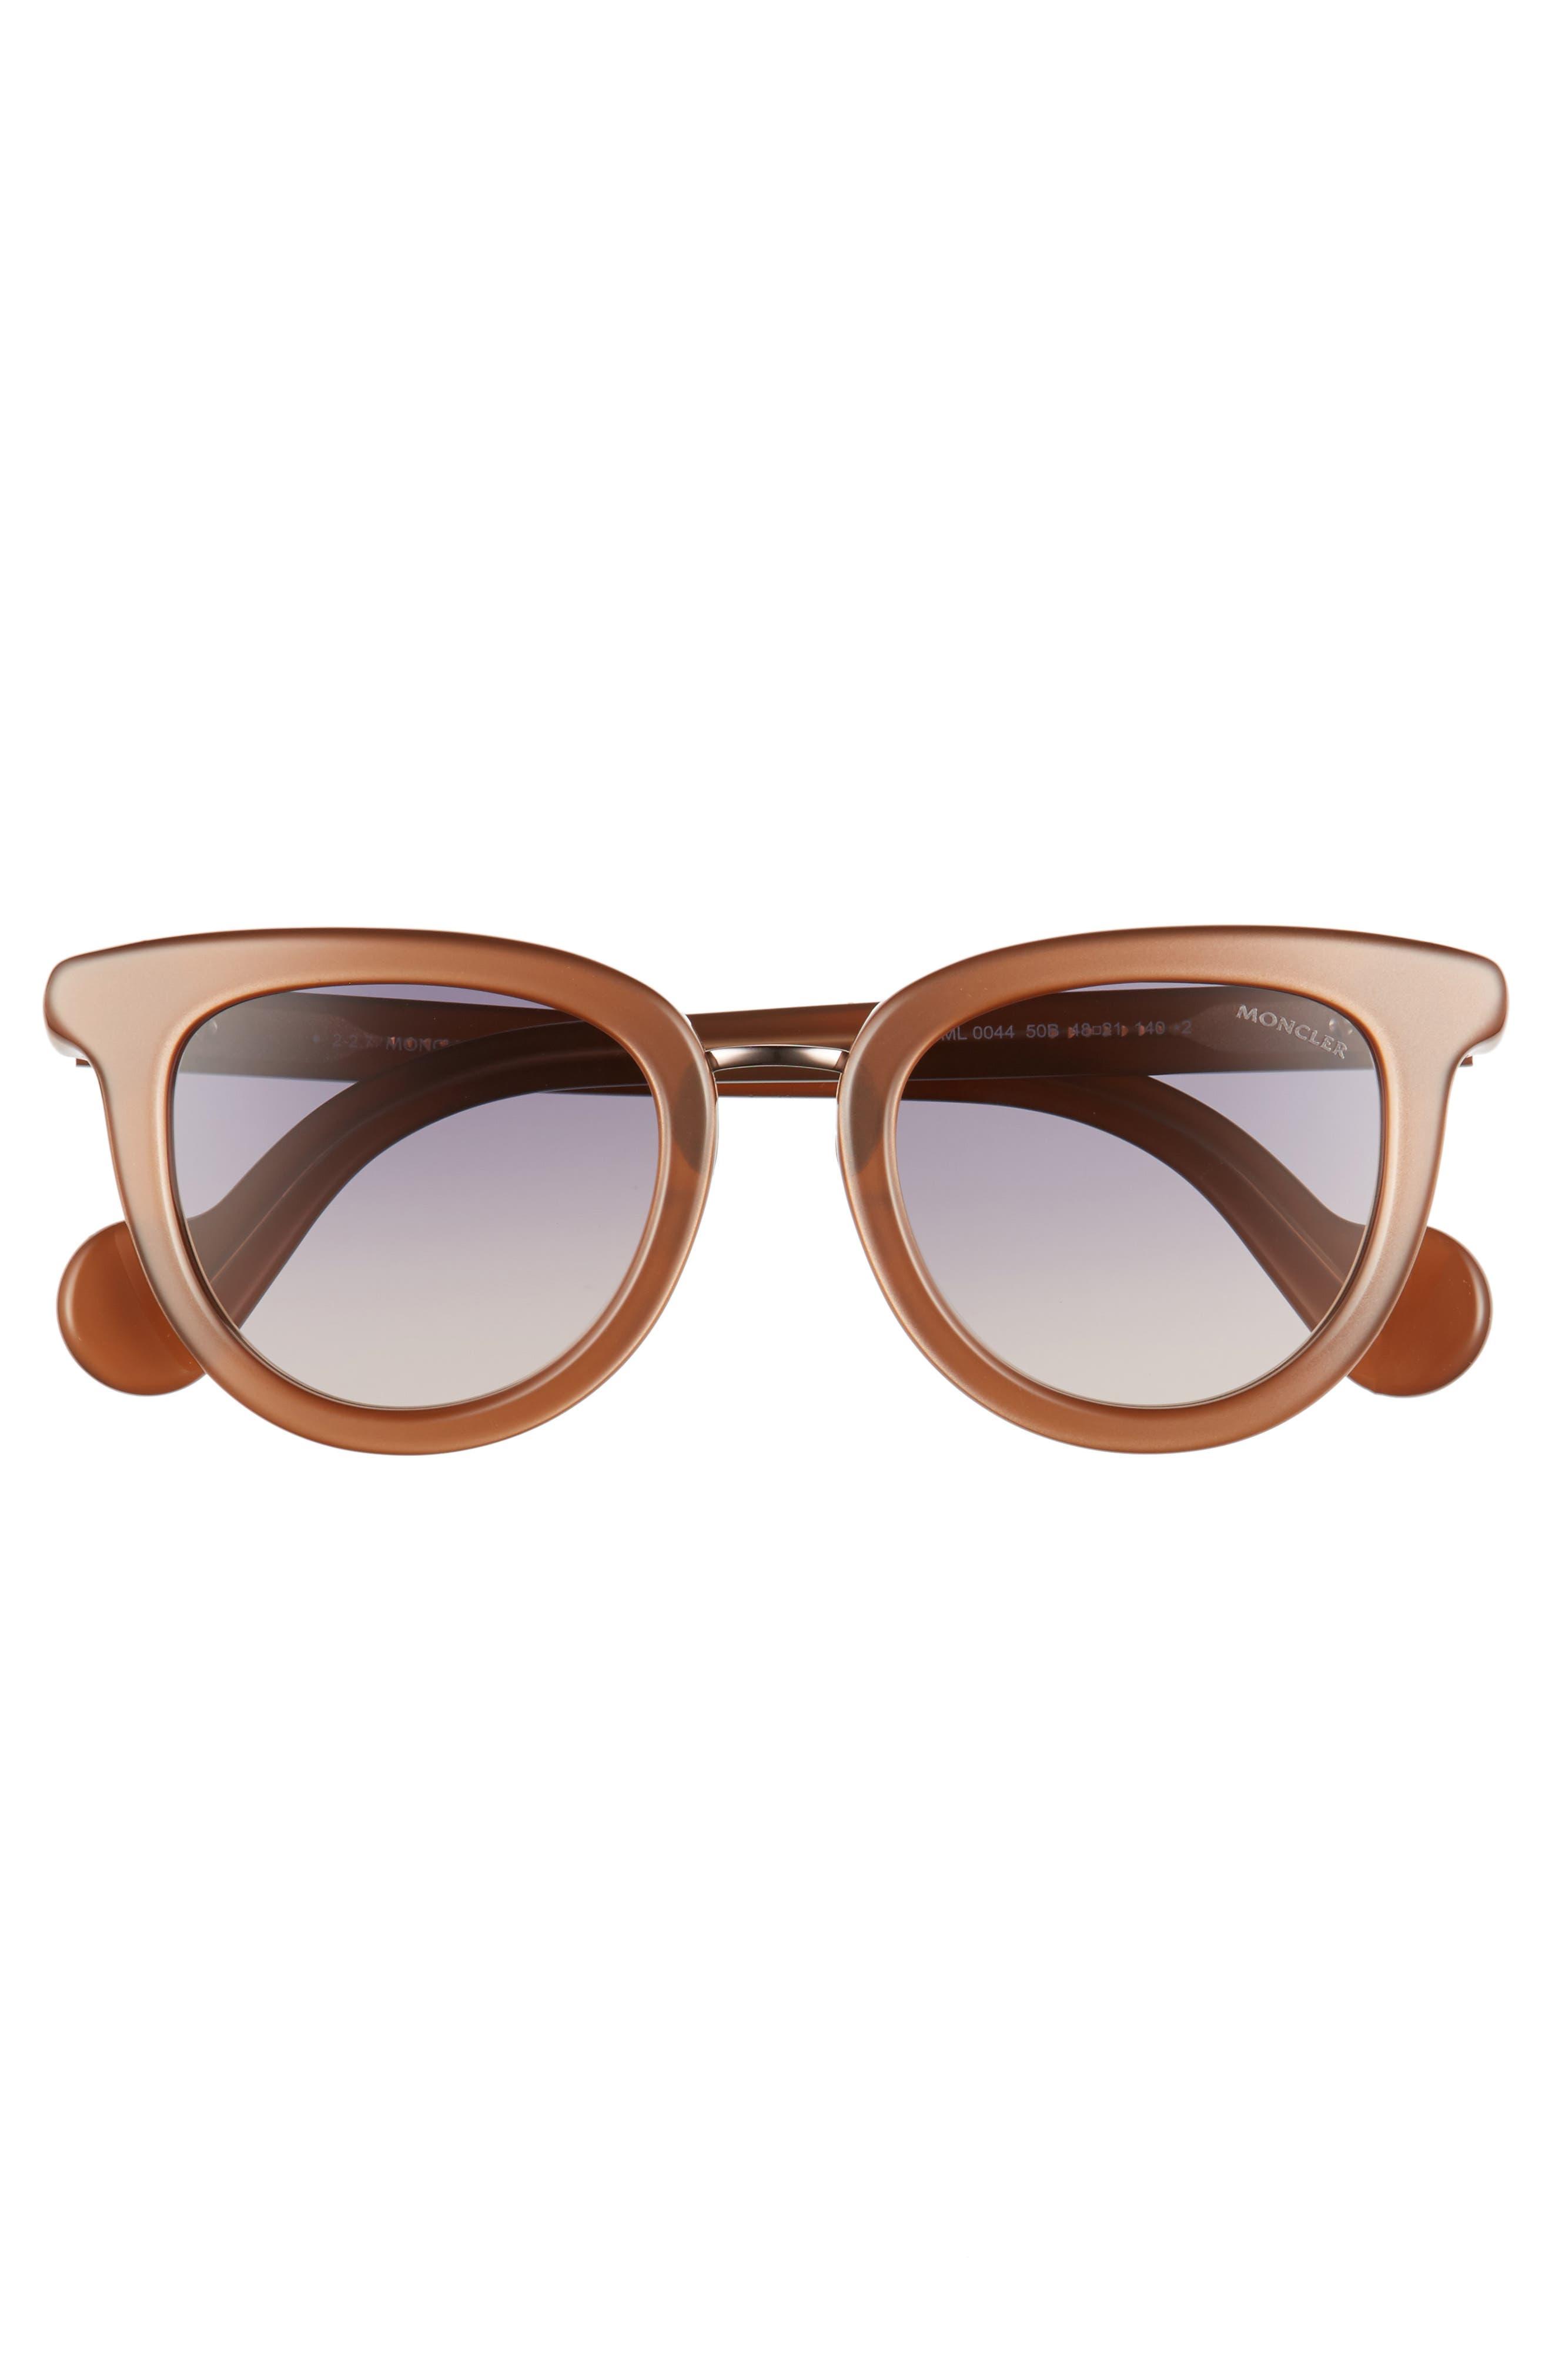 48mm Cat Eye Sunglasses,                             Alternate thumbnail 3, color,                             PEARL BROWN/ GREY/ SAND